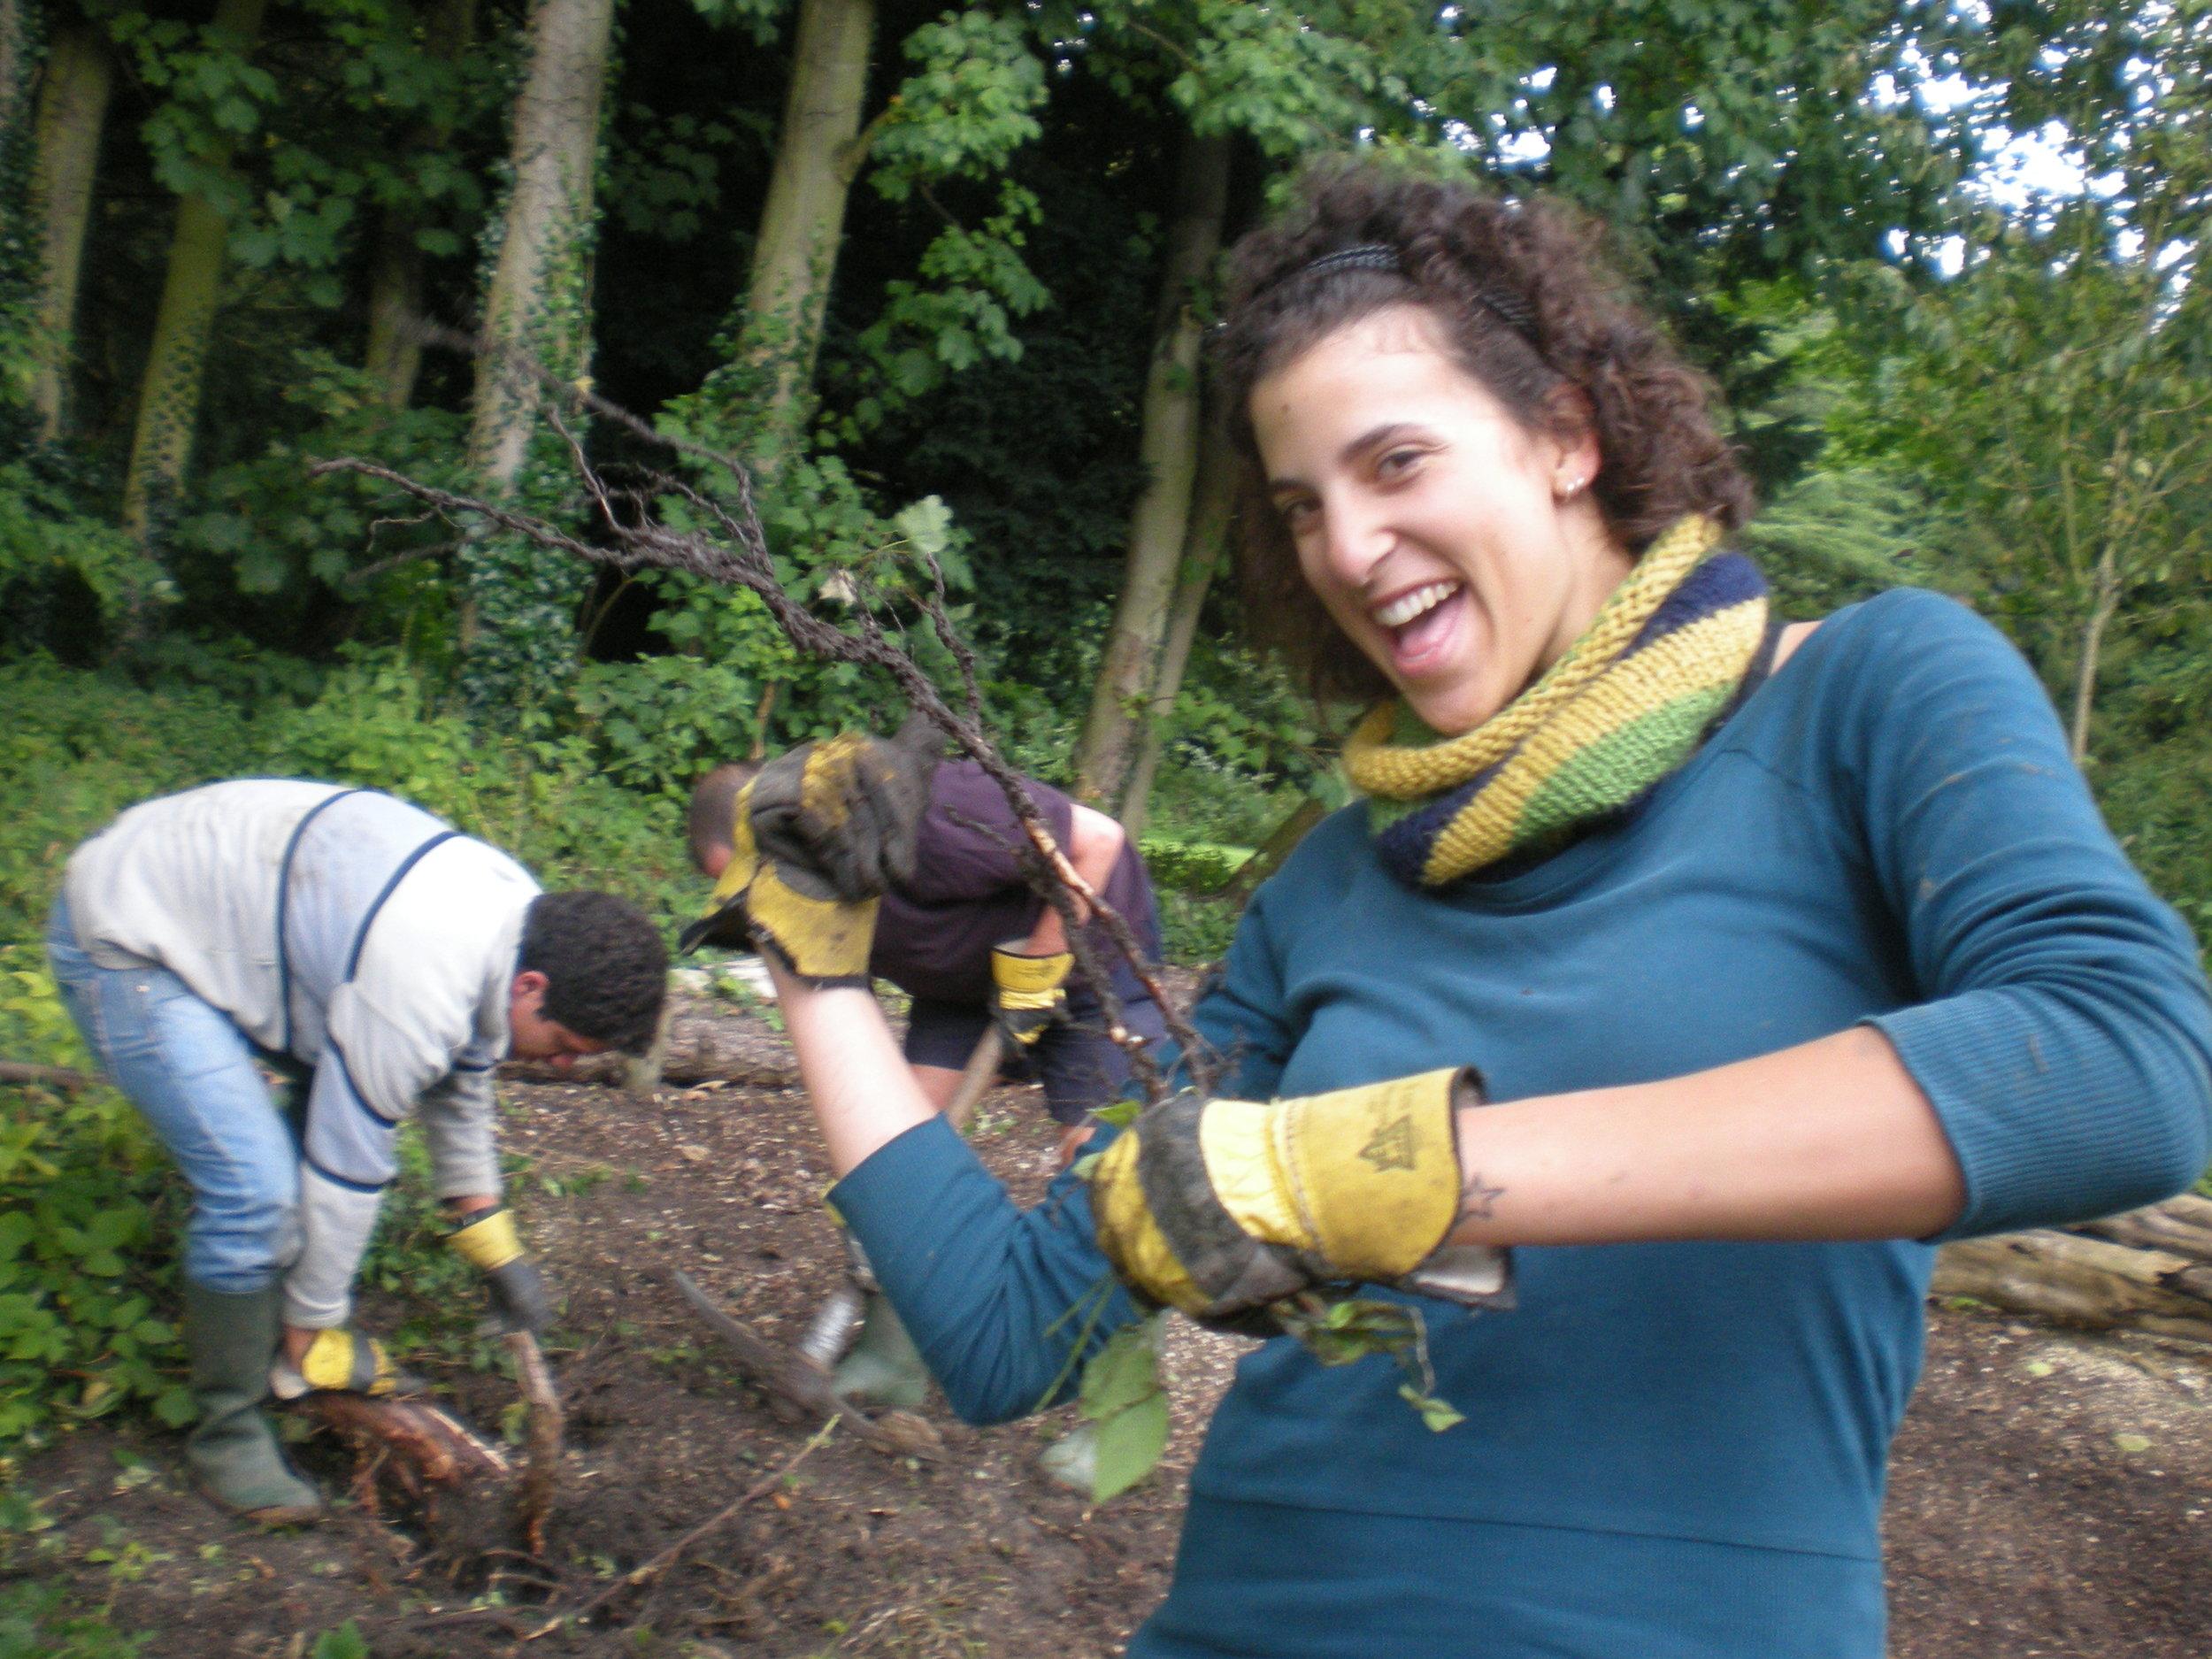 ...I volunteered in a Buddhist Center - Pocklington (UK), September 2008